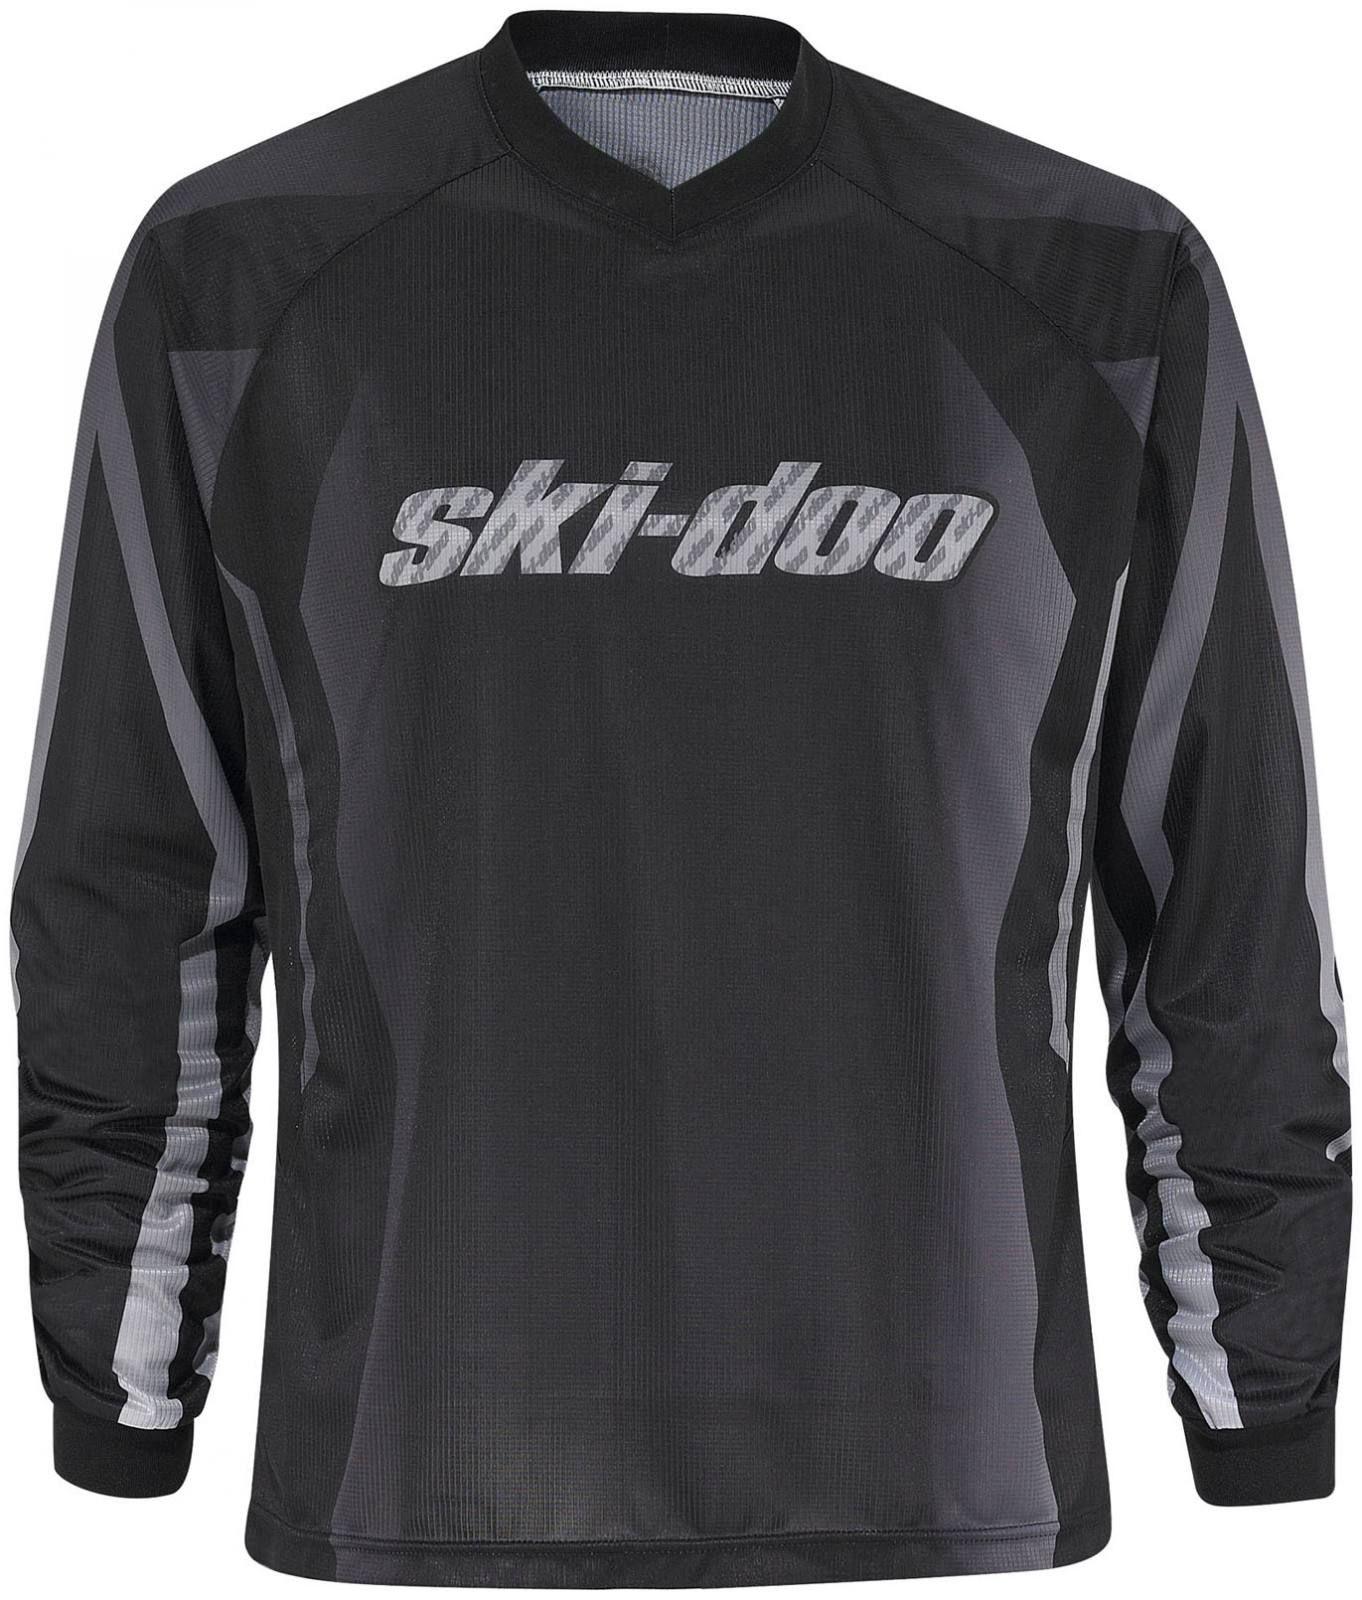 Ski Doo Ski Doo Jersey From St Boni Motor Sports 59 99 Long Sleeve Tshirt Men Skiing Jersey